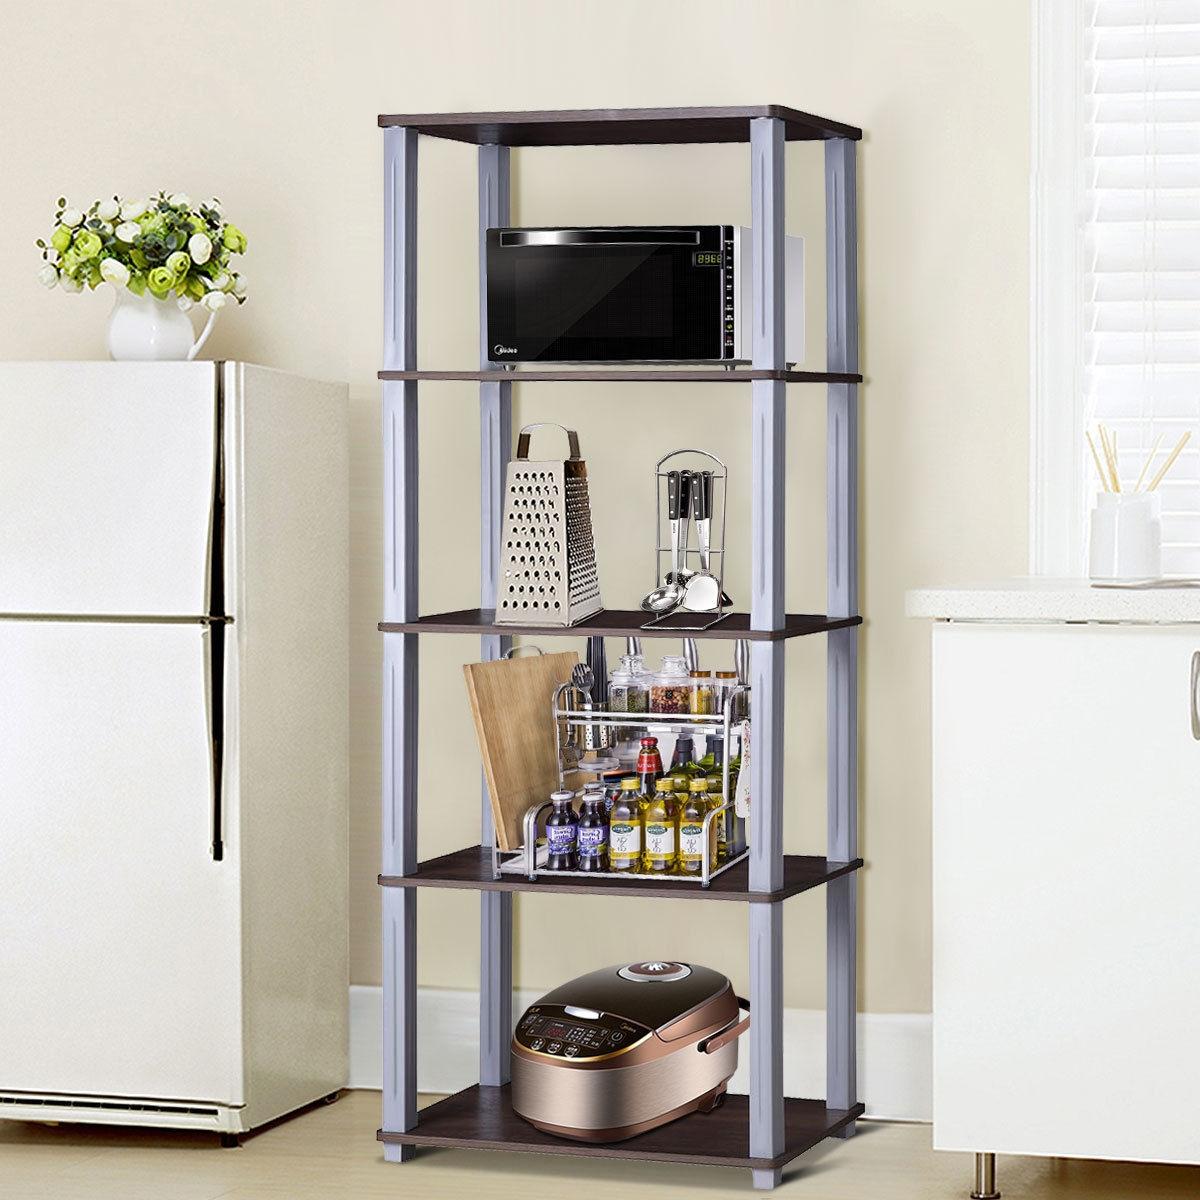 5-Tier Multi-Functional Storage Shelves Rack Display Bookcase-Coffee